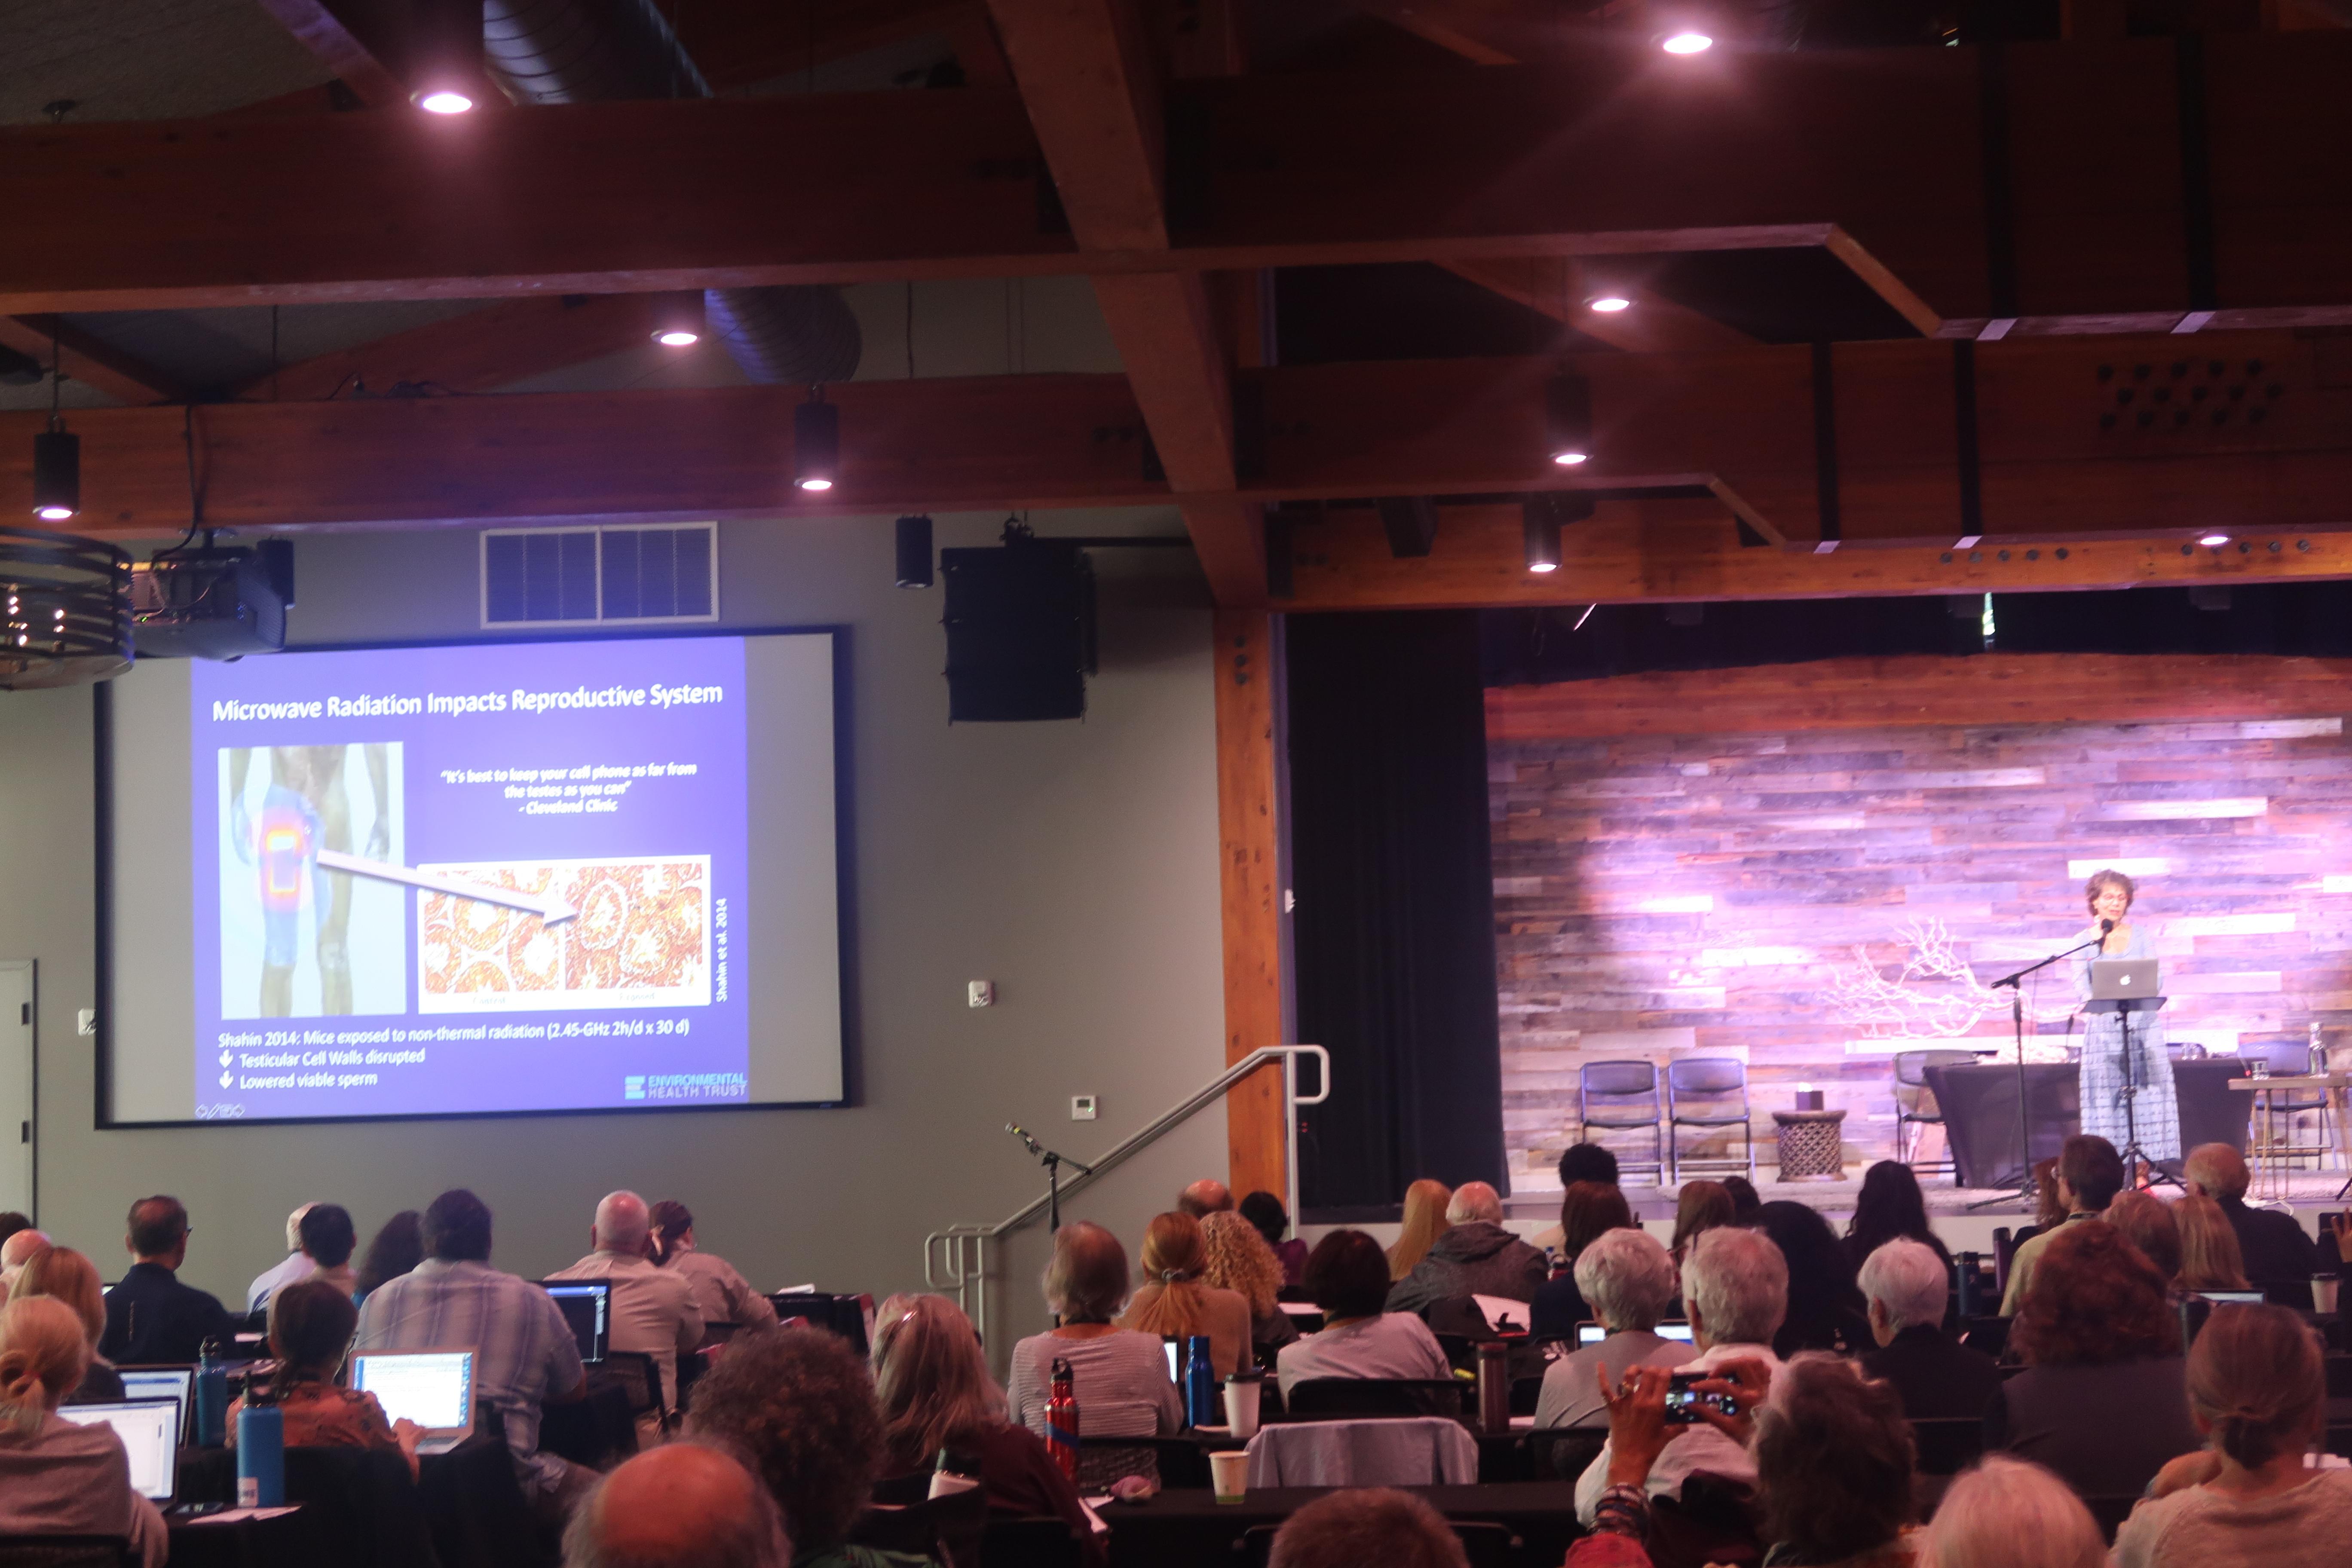 Global Experts Speak at EMF Conference 2019 in Santa Cruz, Smombie Gate | 5G | EMF